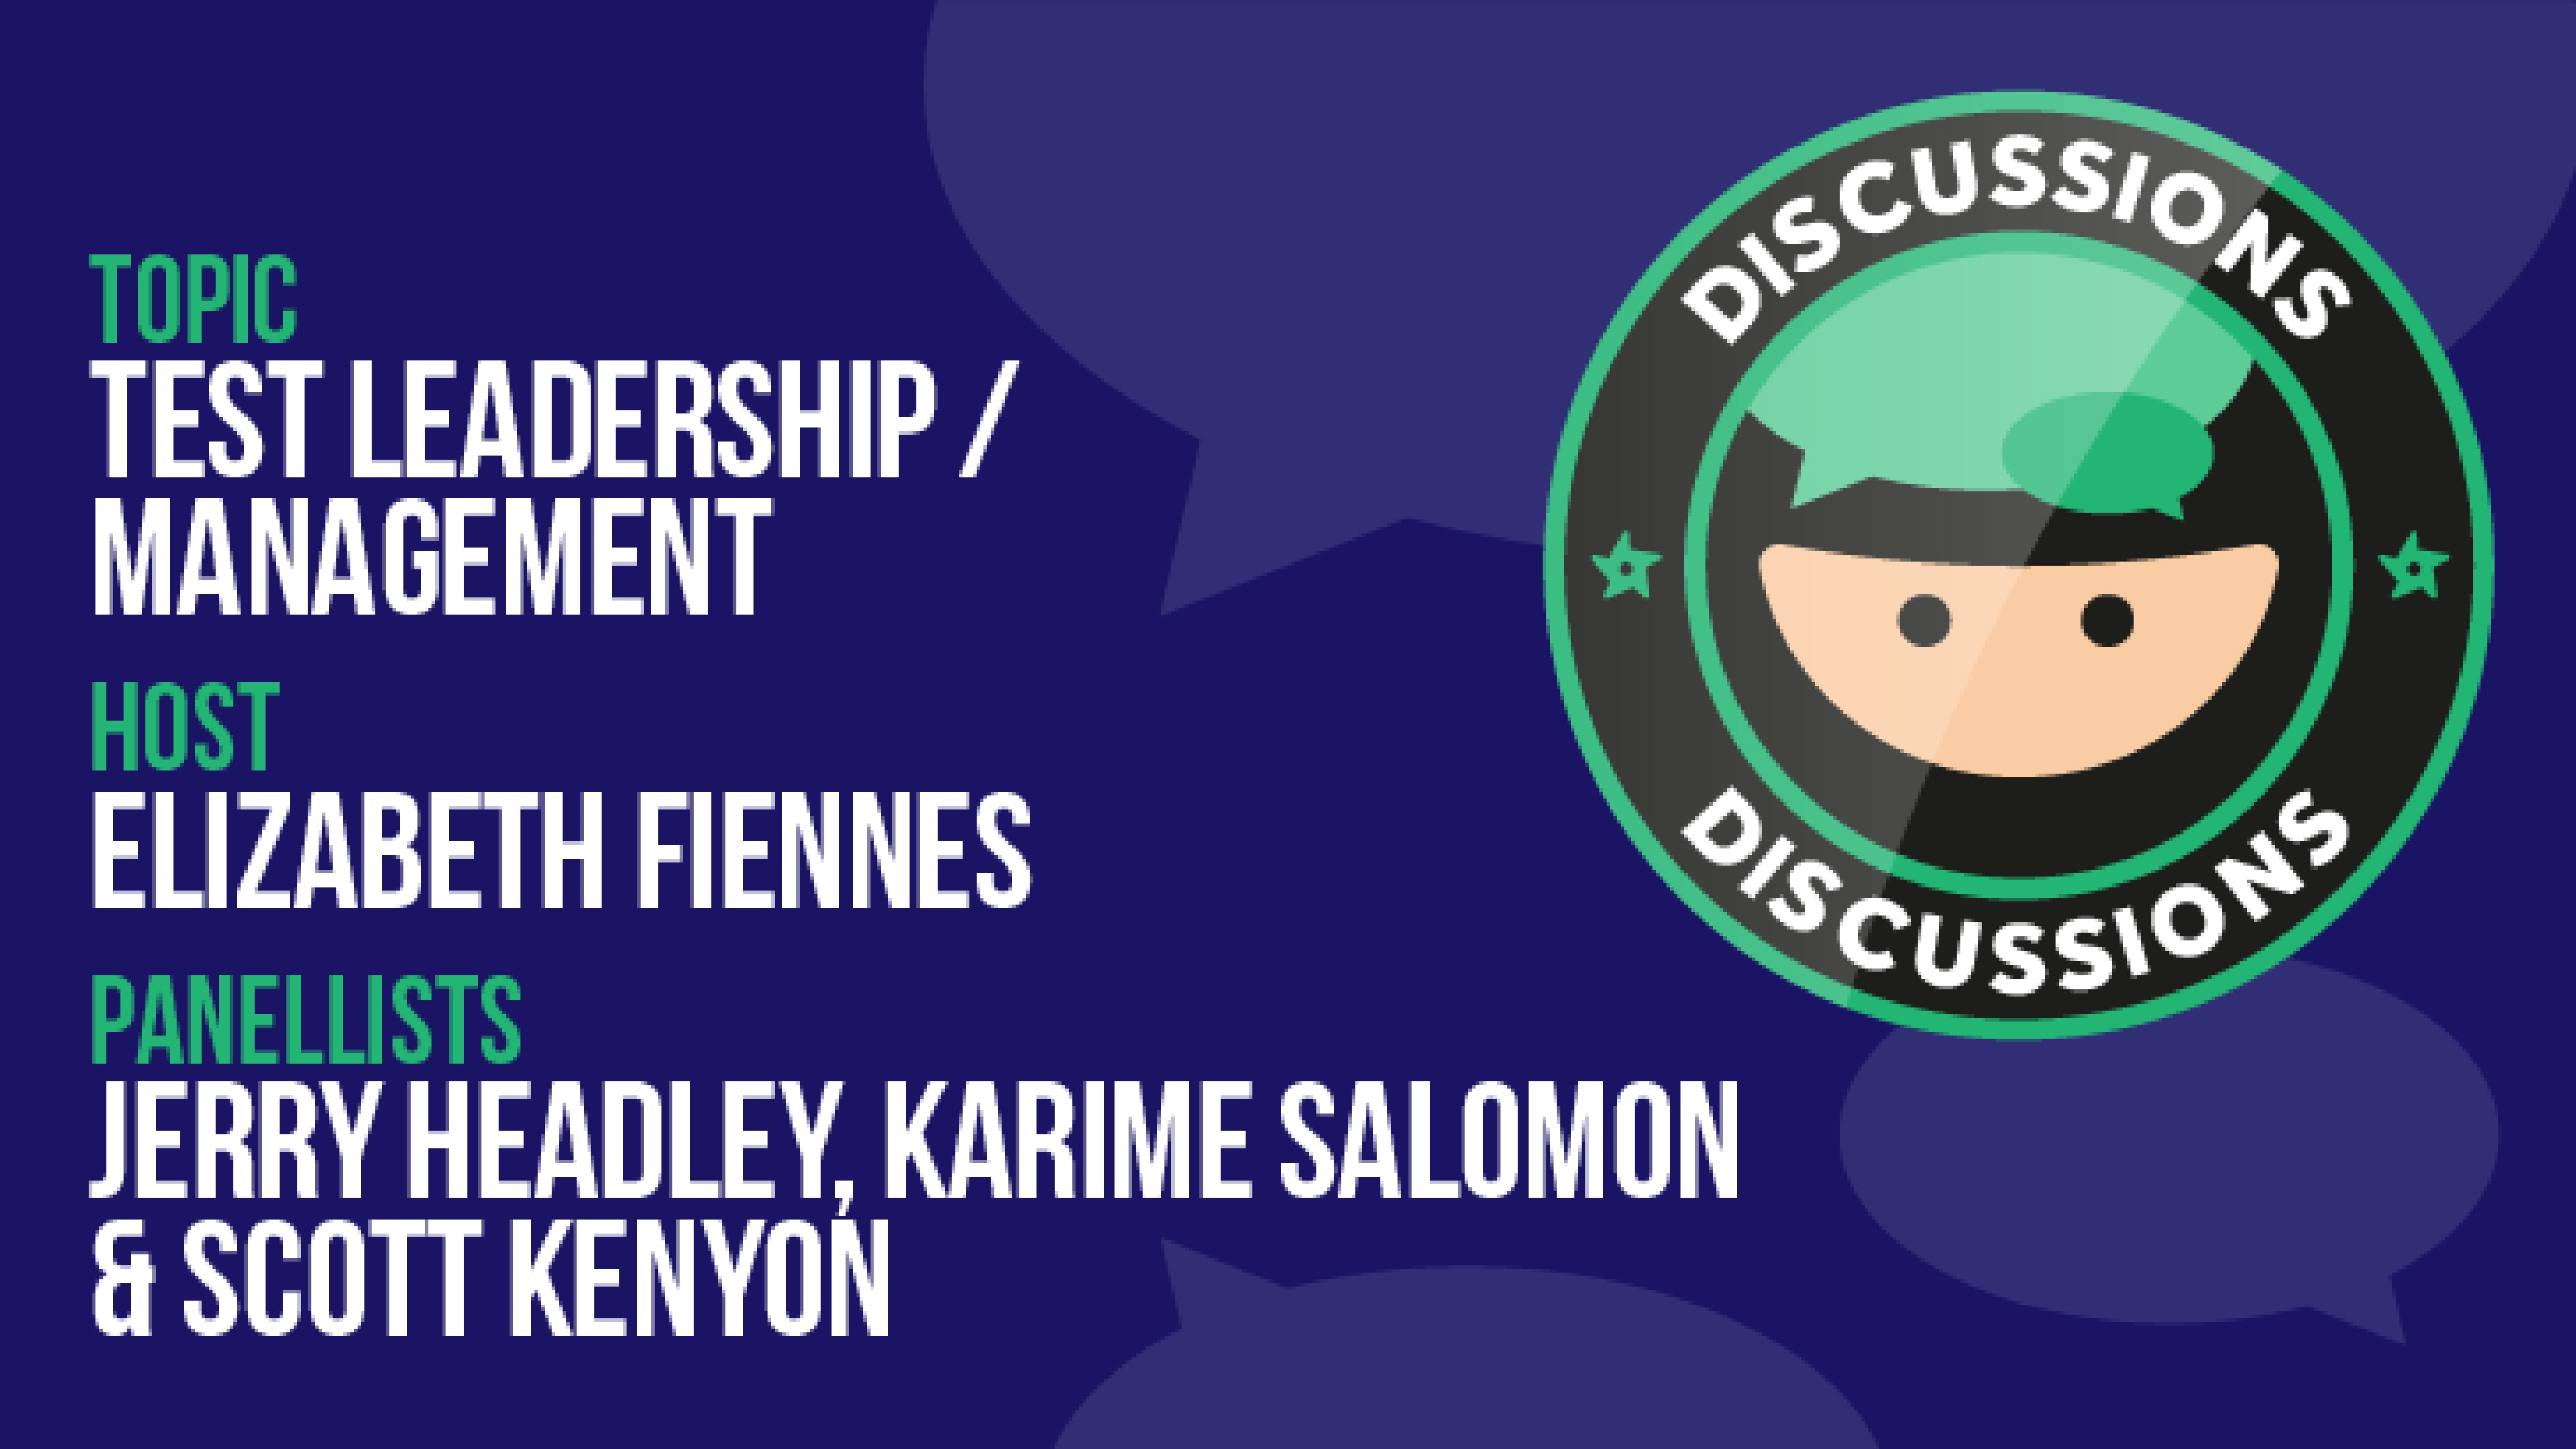 Discussion: Test Leadership/Management